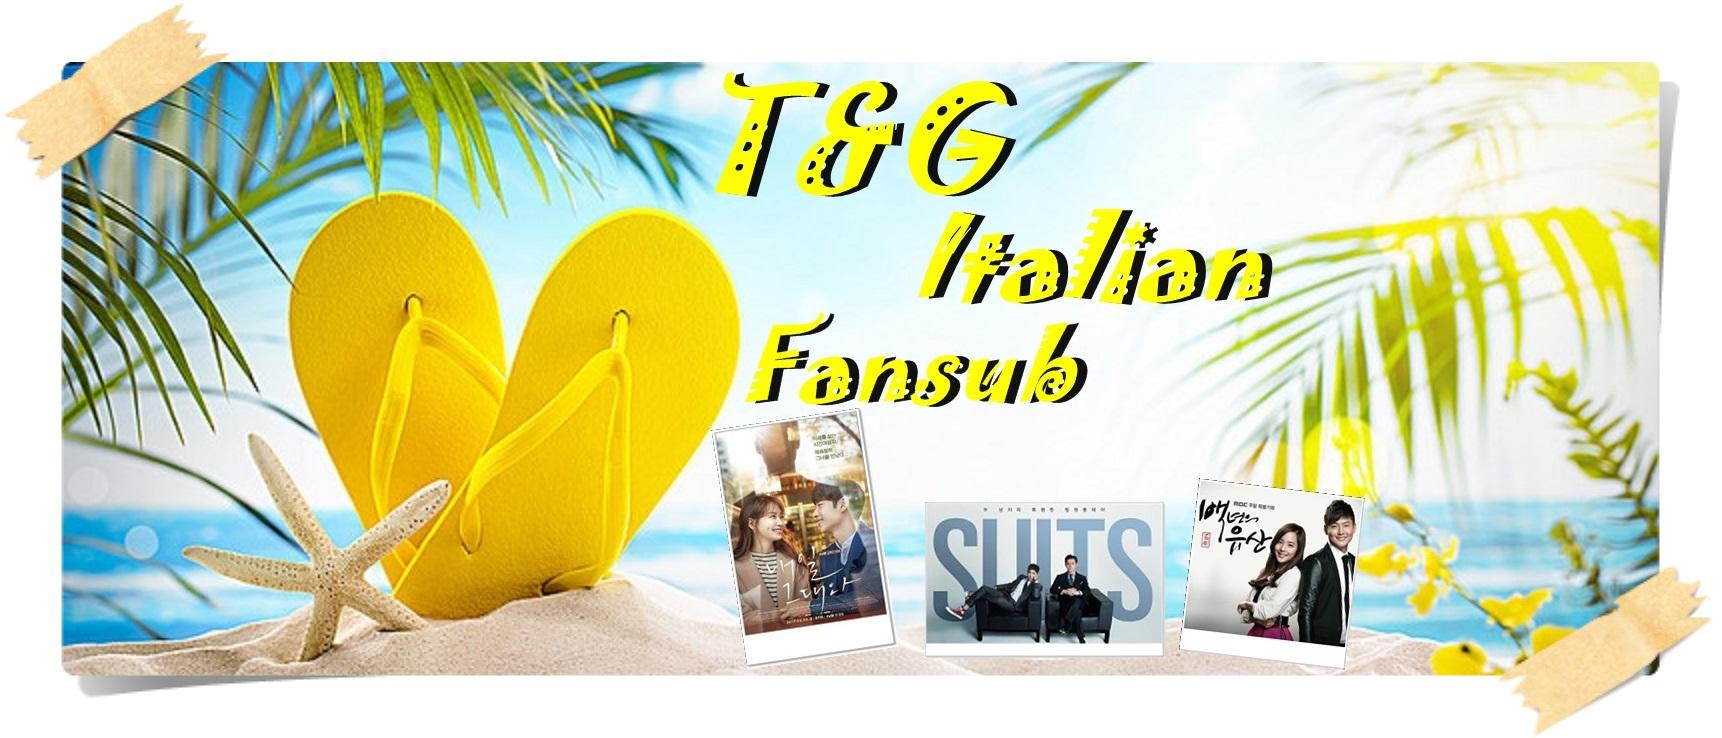 T&G Italian Fansub